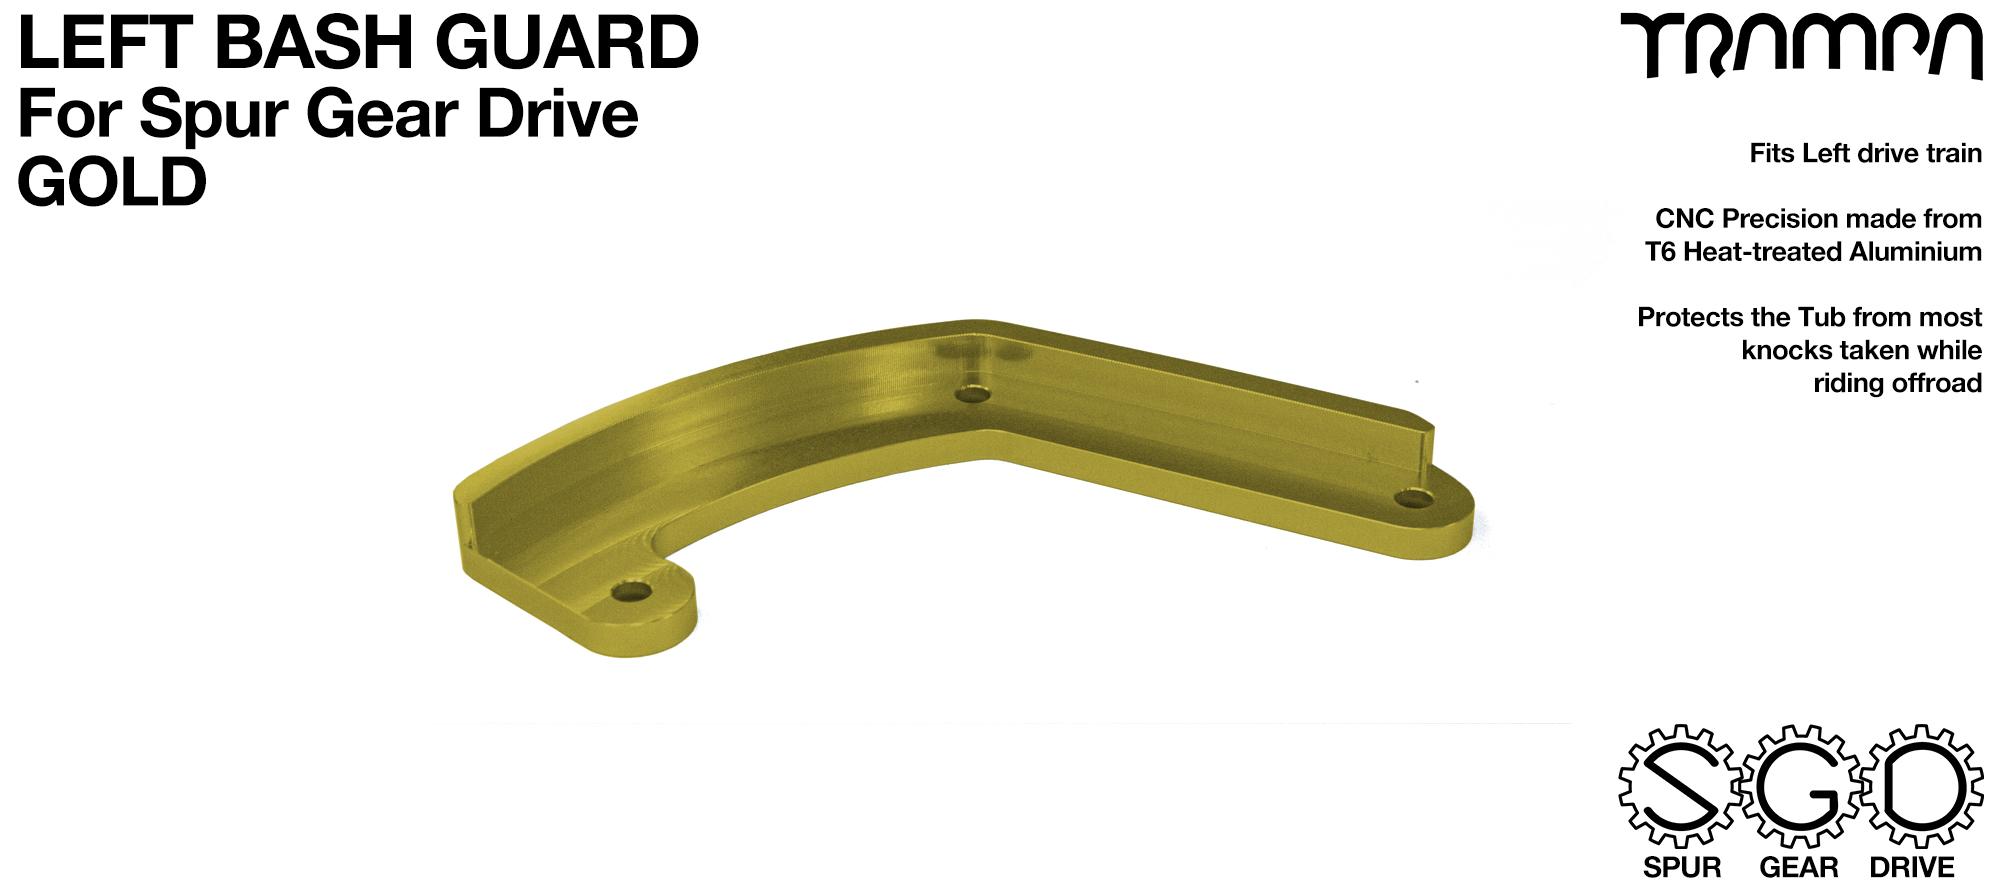 SPUR Gear Drive Bash Guard - LEFT Side - GOLD